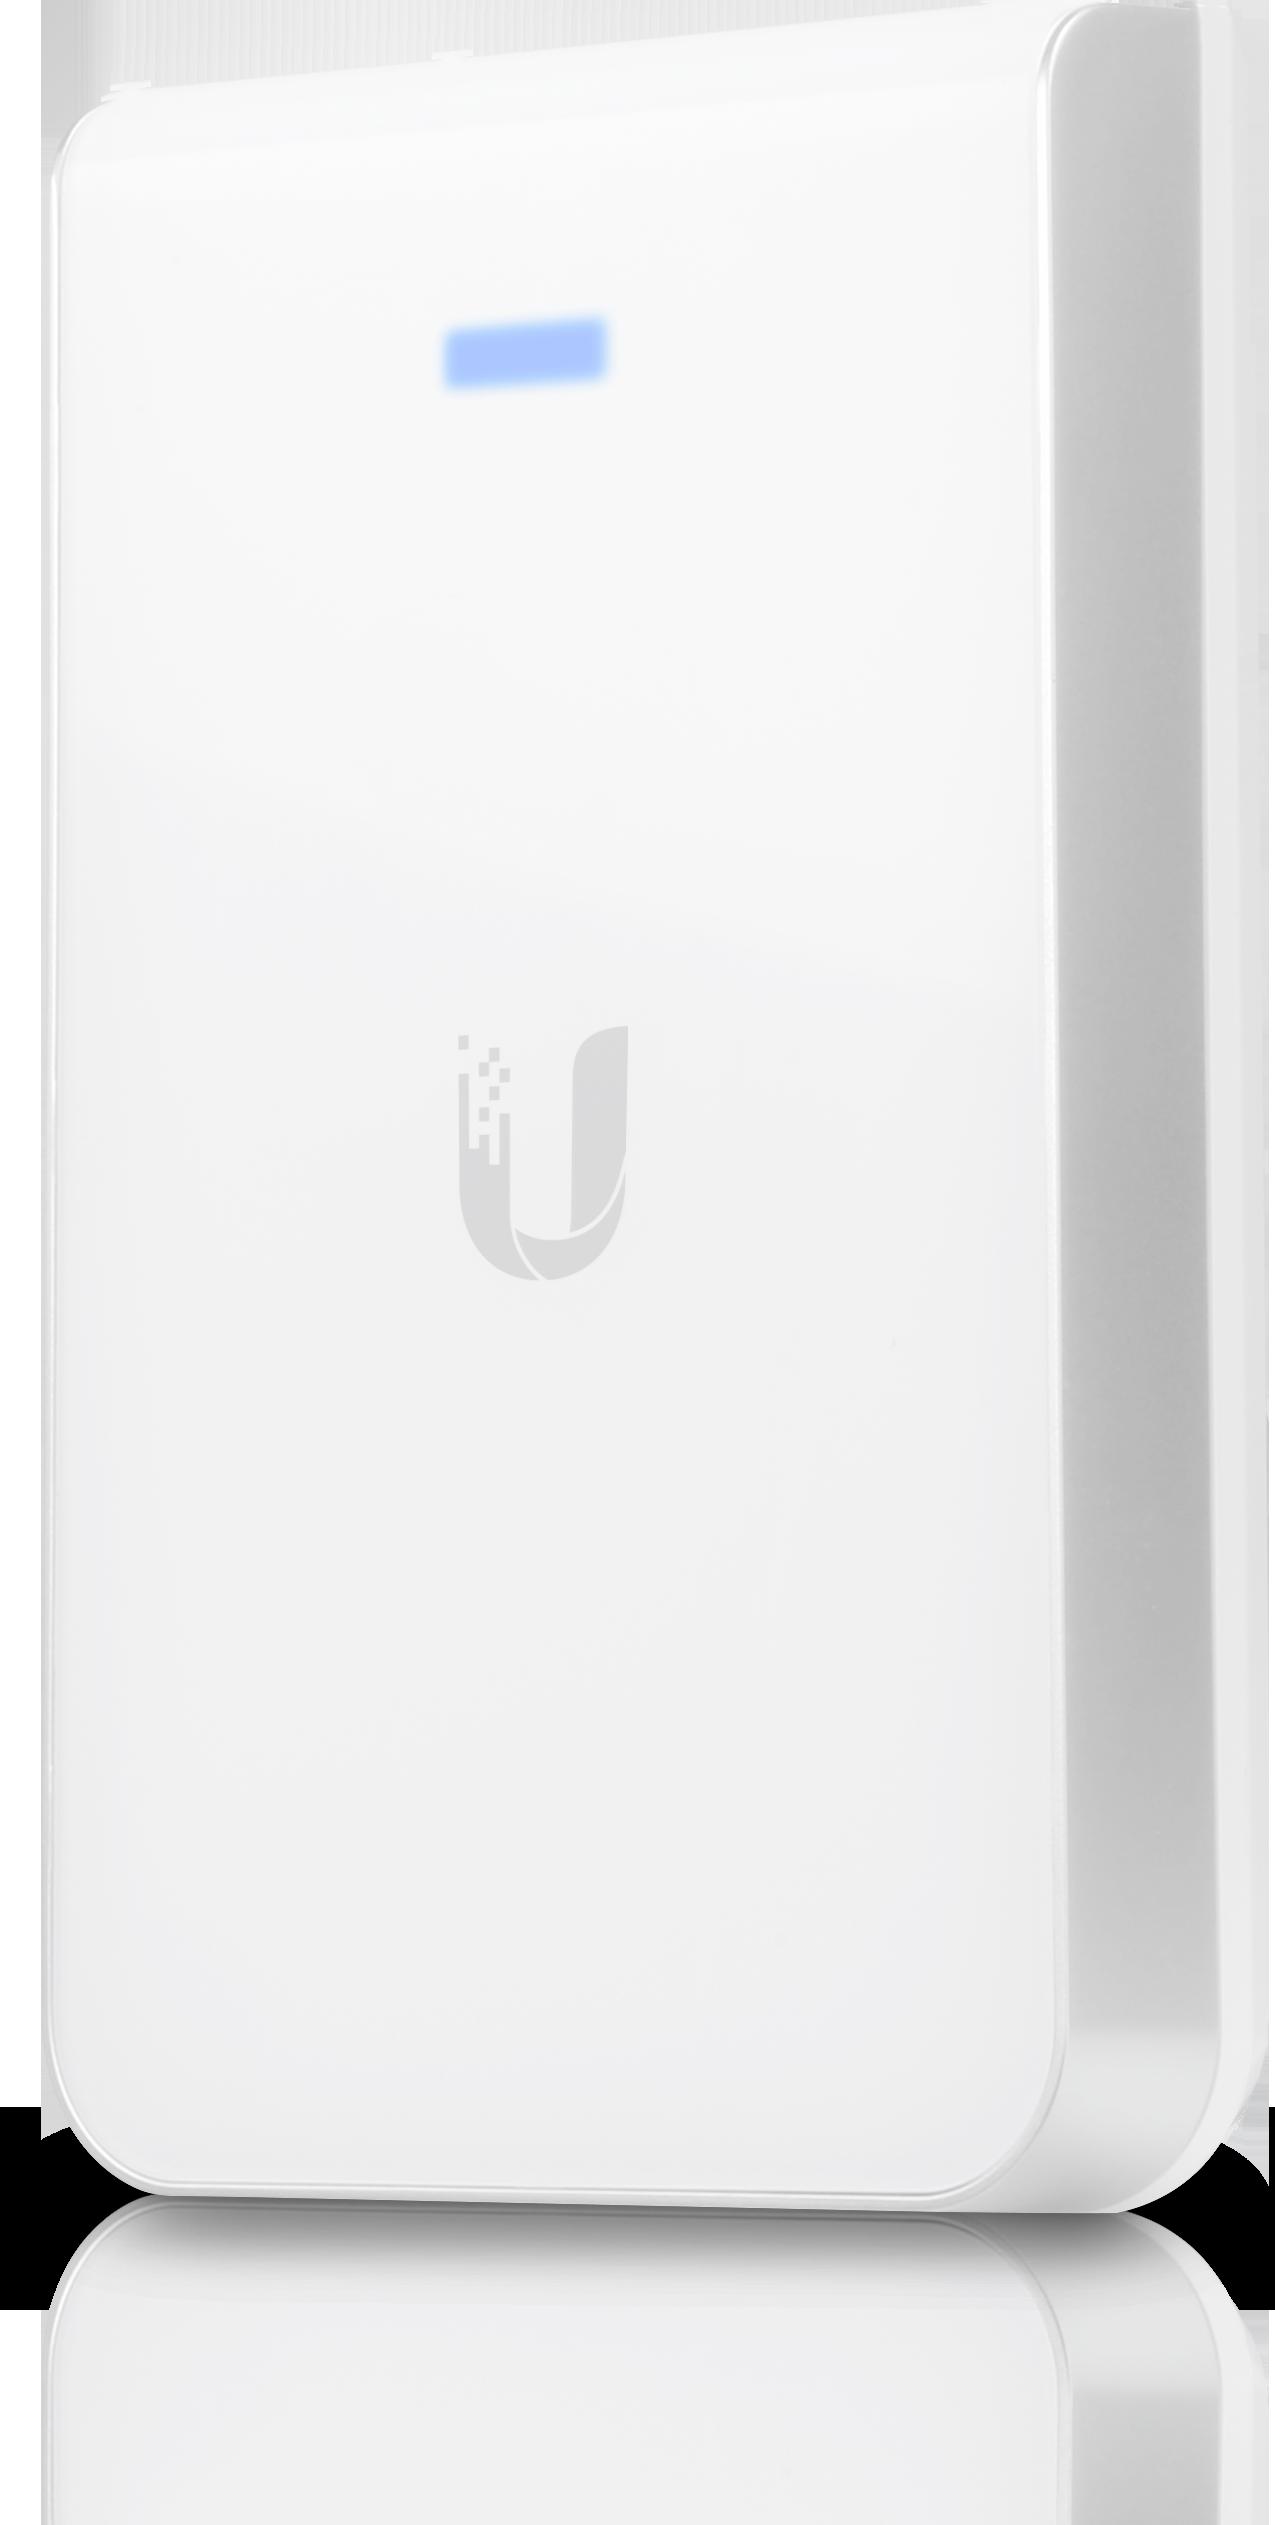 UniFi AC IW AP with Ethernet port